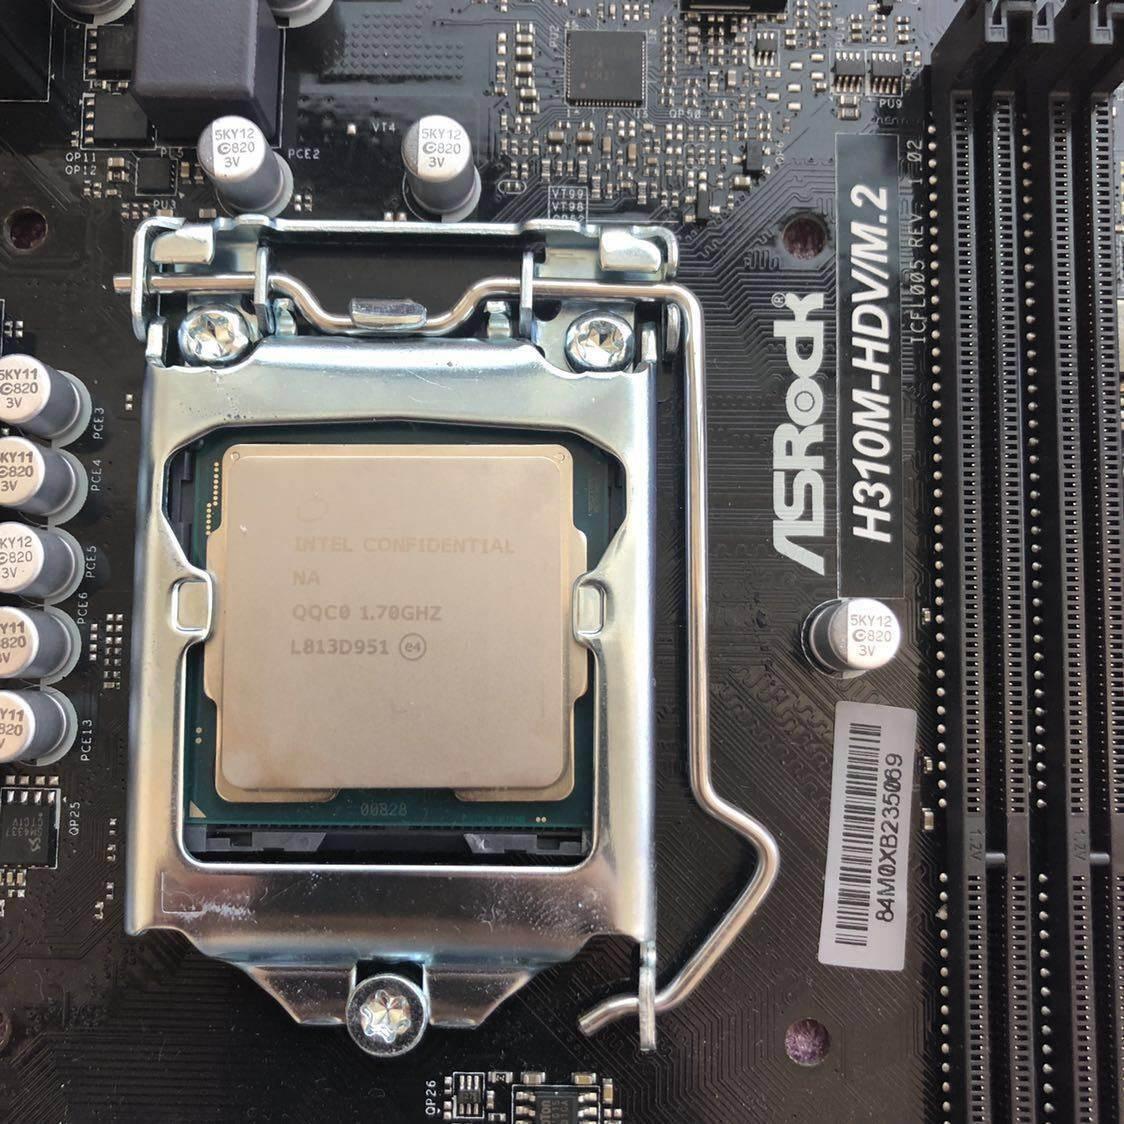 Düşük güç tüketimli Intel Core i9-9900T açığa çıktı